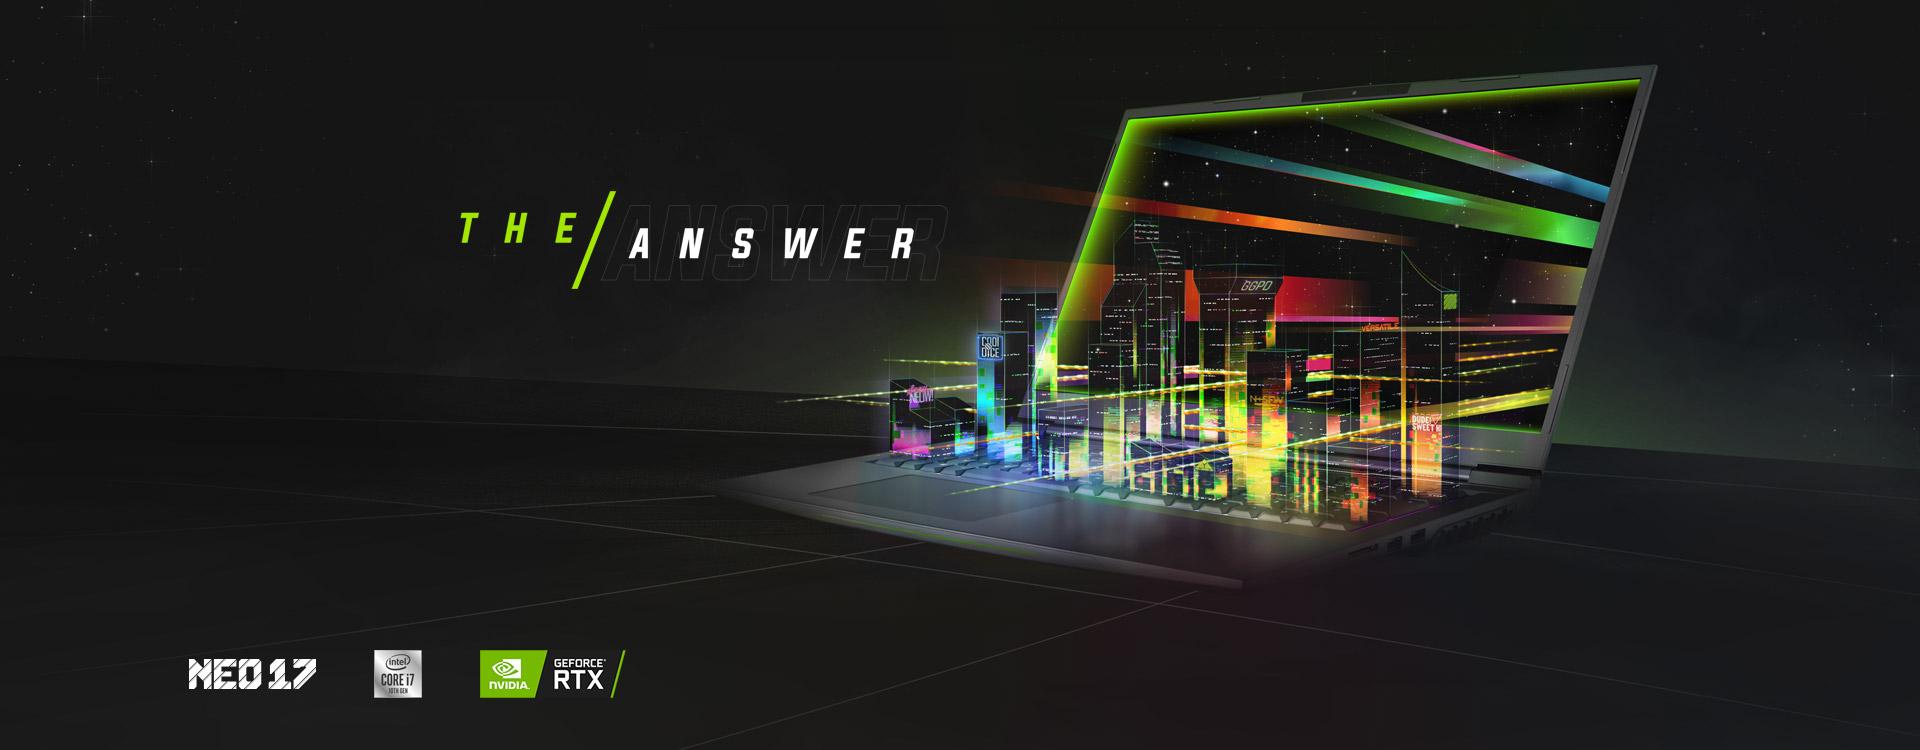 XMG NEO Gaming Laptop NVIDIA GeForce RTX